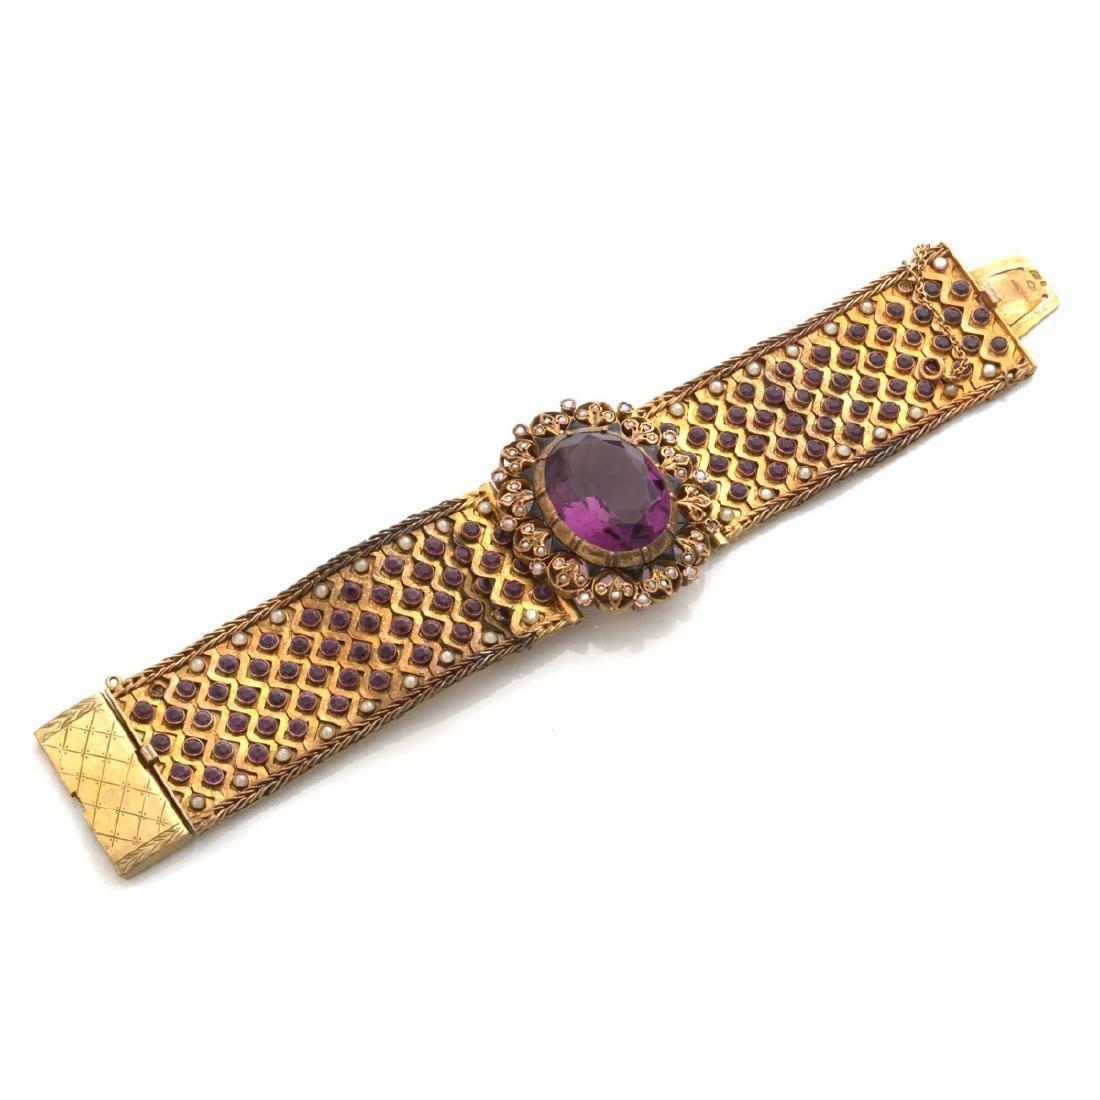 Hungarian Purple Glass, Seed Pearl, Enamel, Silver-Gilt